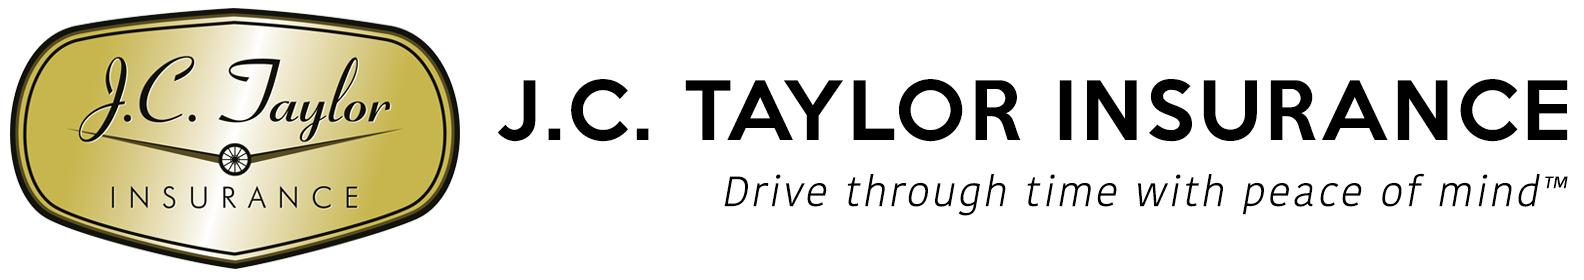 jctaylor-classic-car-insurance-logo.png